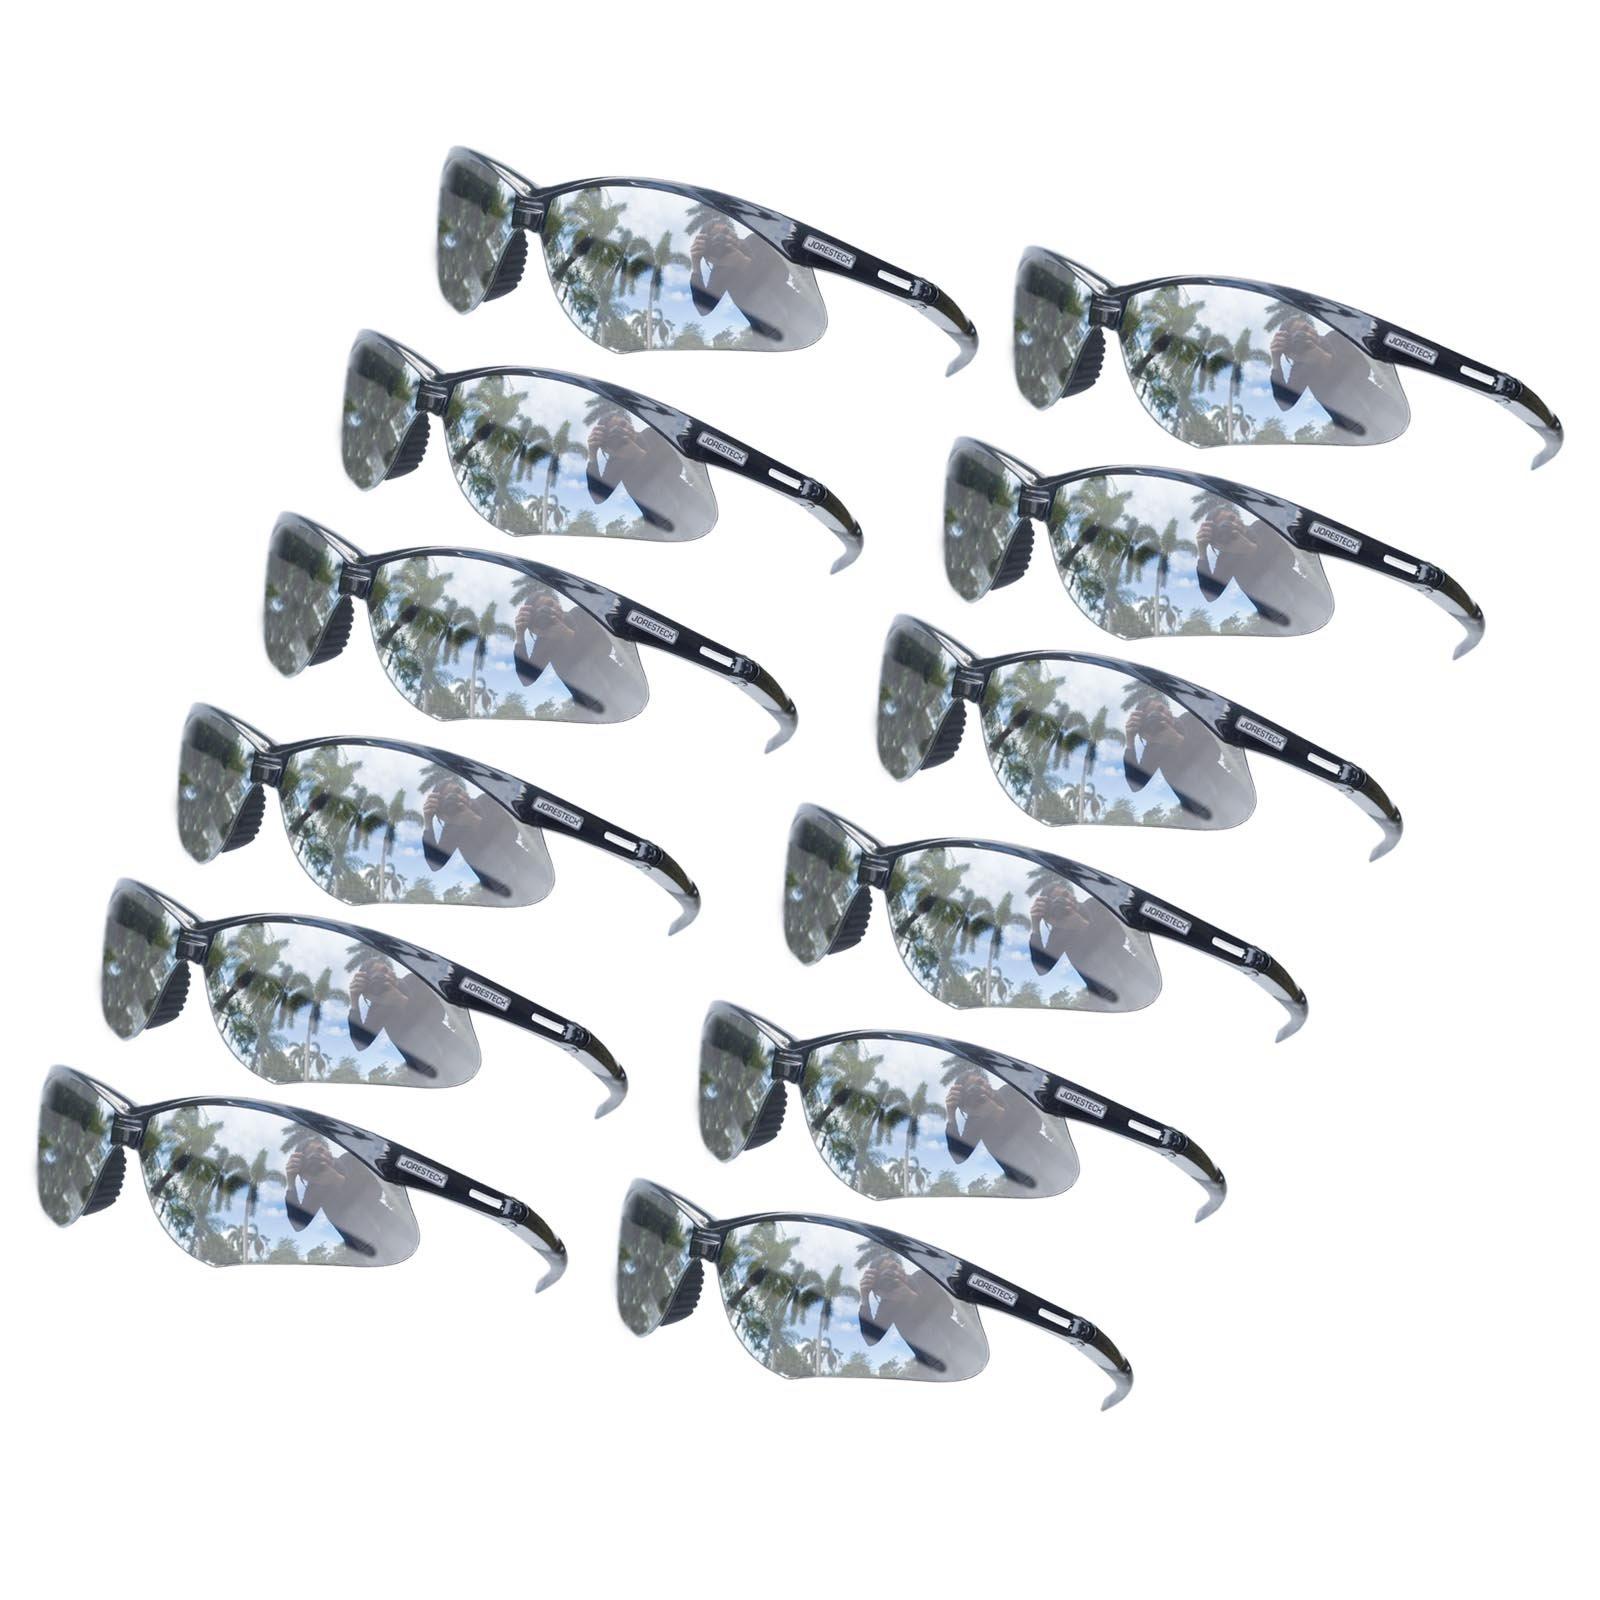 JORESTECH Eyewear - UV protection Safety Protective Glasses Case of 12 Mirror ANSI Z87+